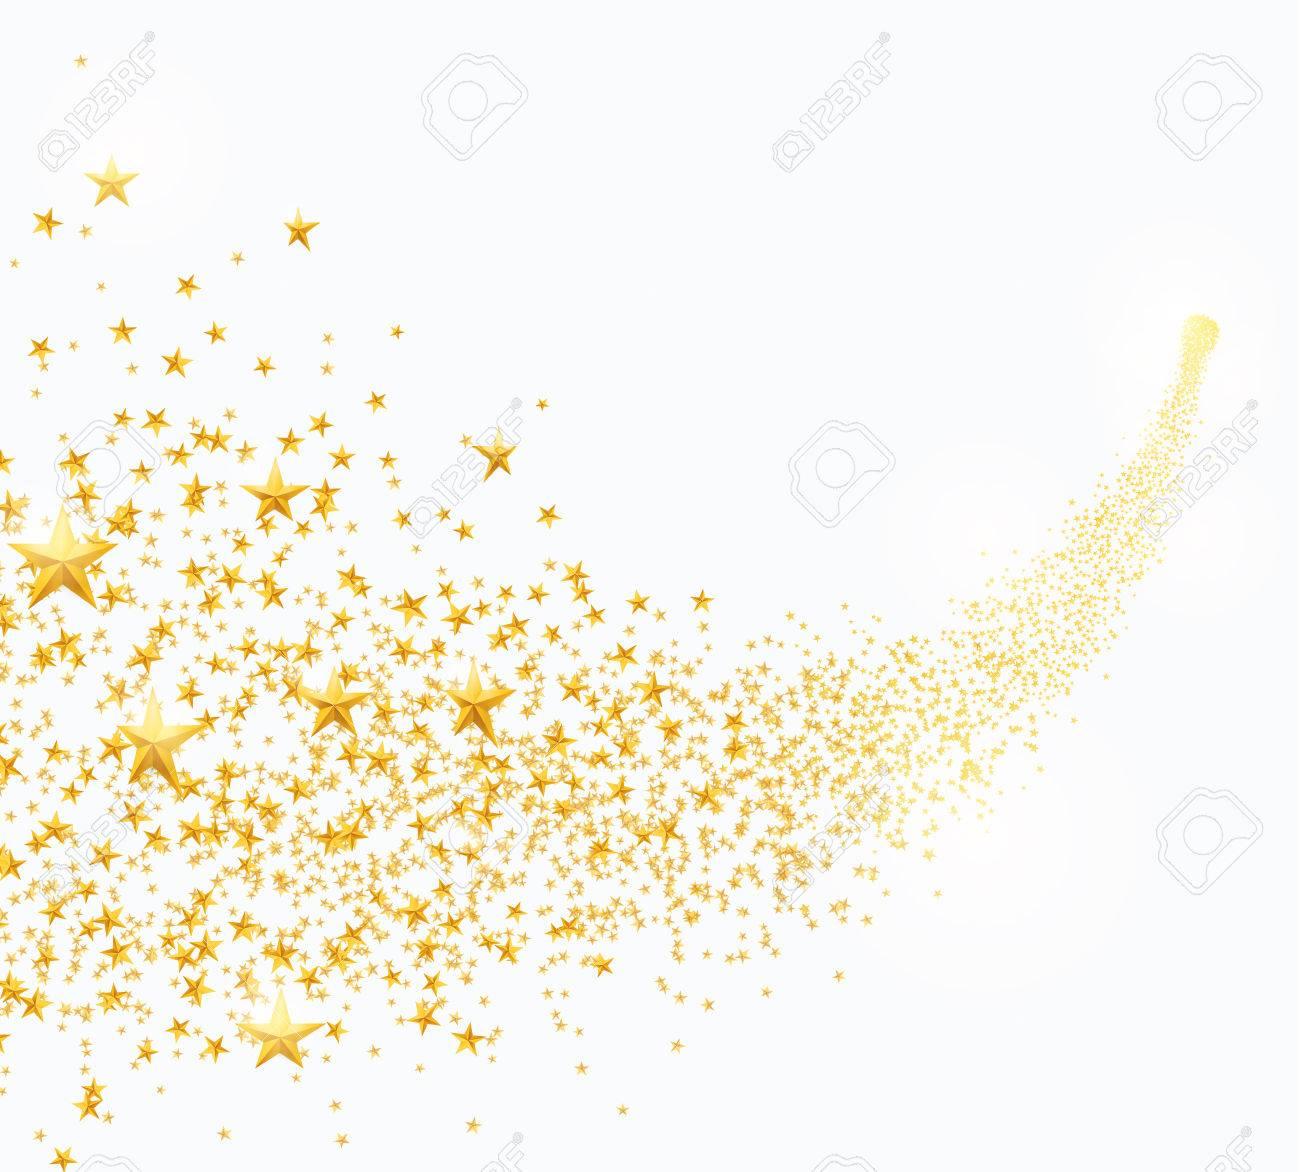 Vector illustration of abstract falling golden stars, dust - 87349406